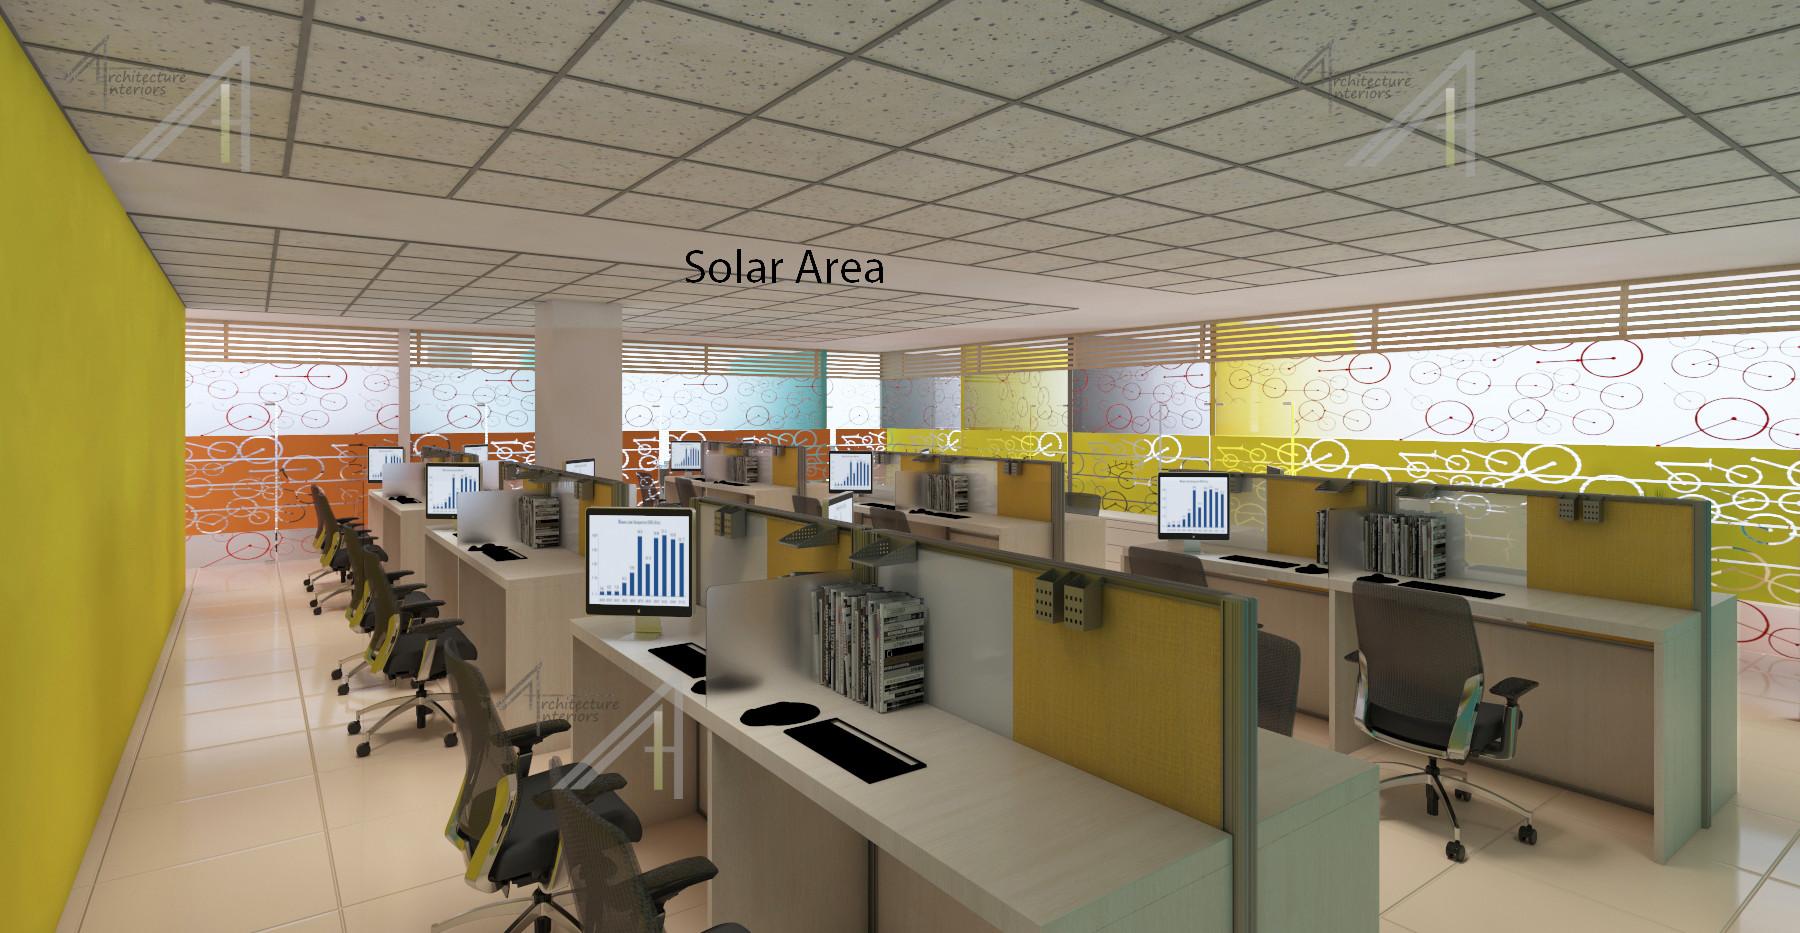 01_Solar area.jpg